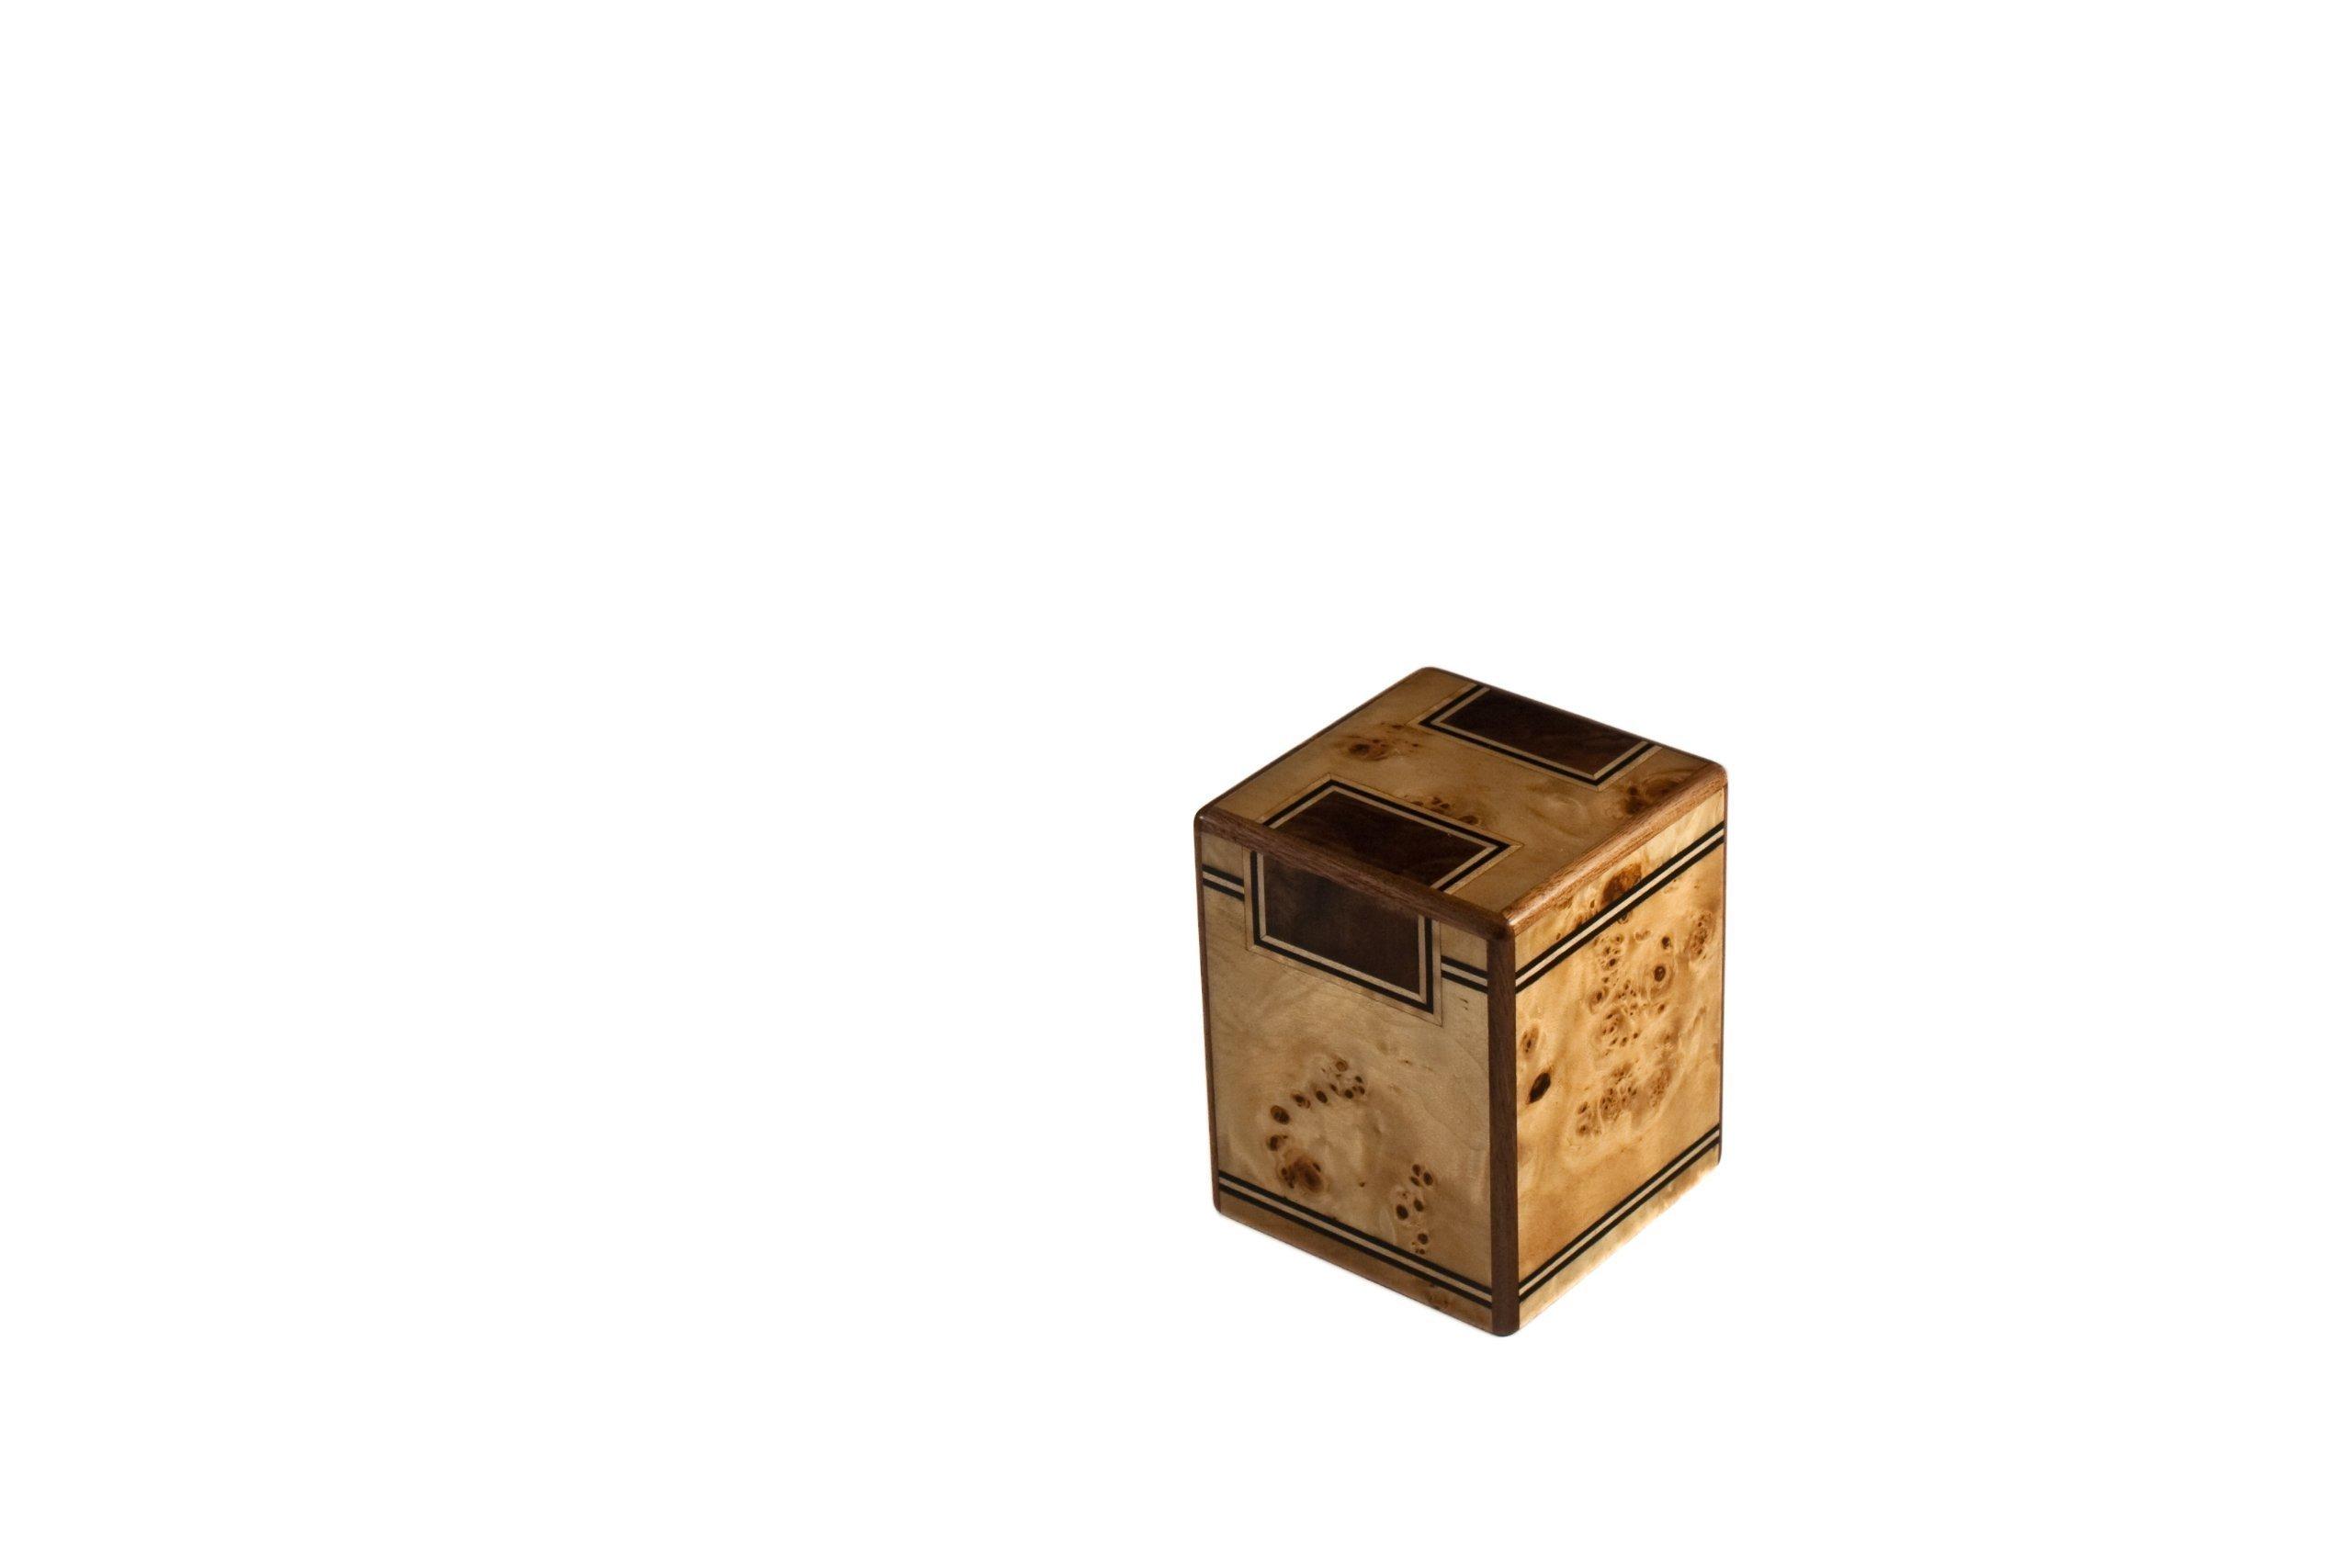 Chateau Urns, Premium Small wood Pet Urn, Keepsake Urn Chambord series by Unforgettable Urns